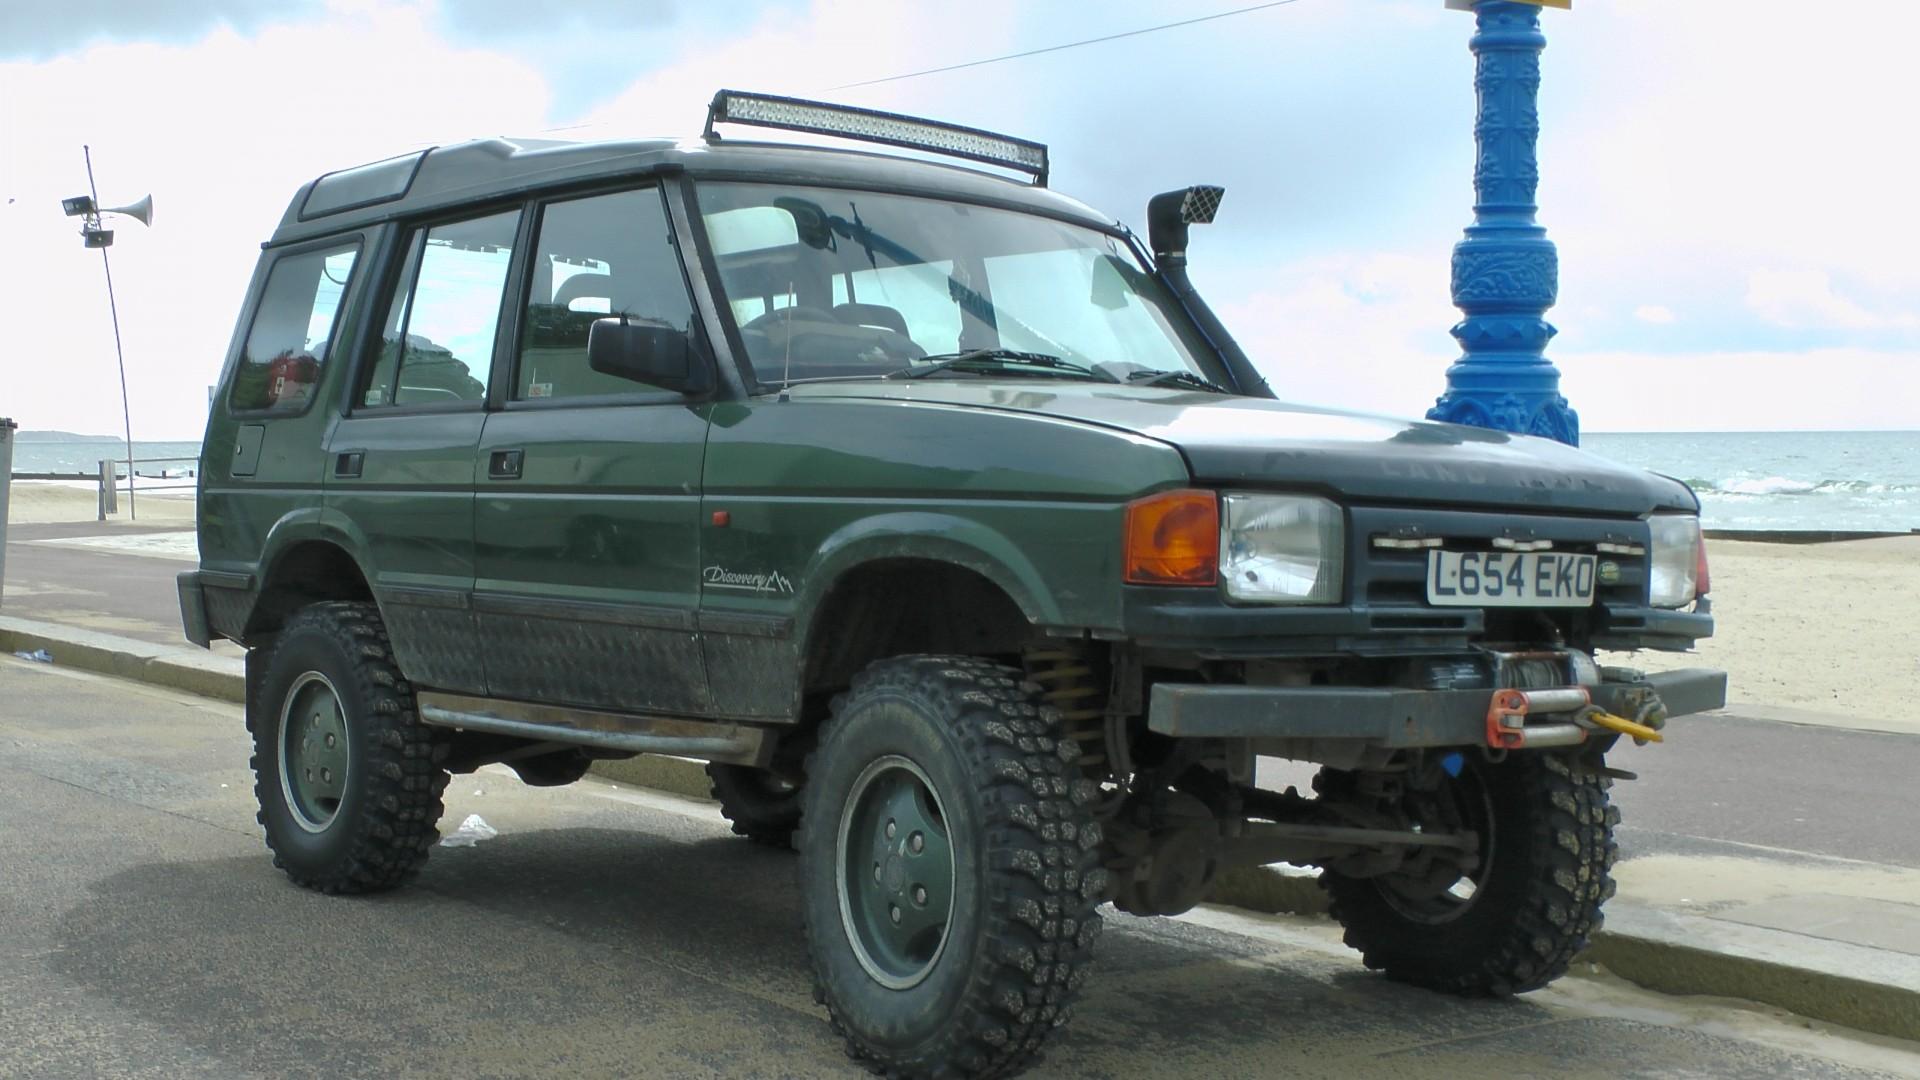 Land Rover Jeep 4x4 Free Stock Public Domain